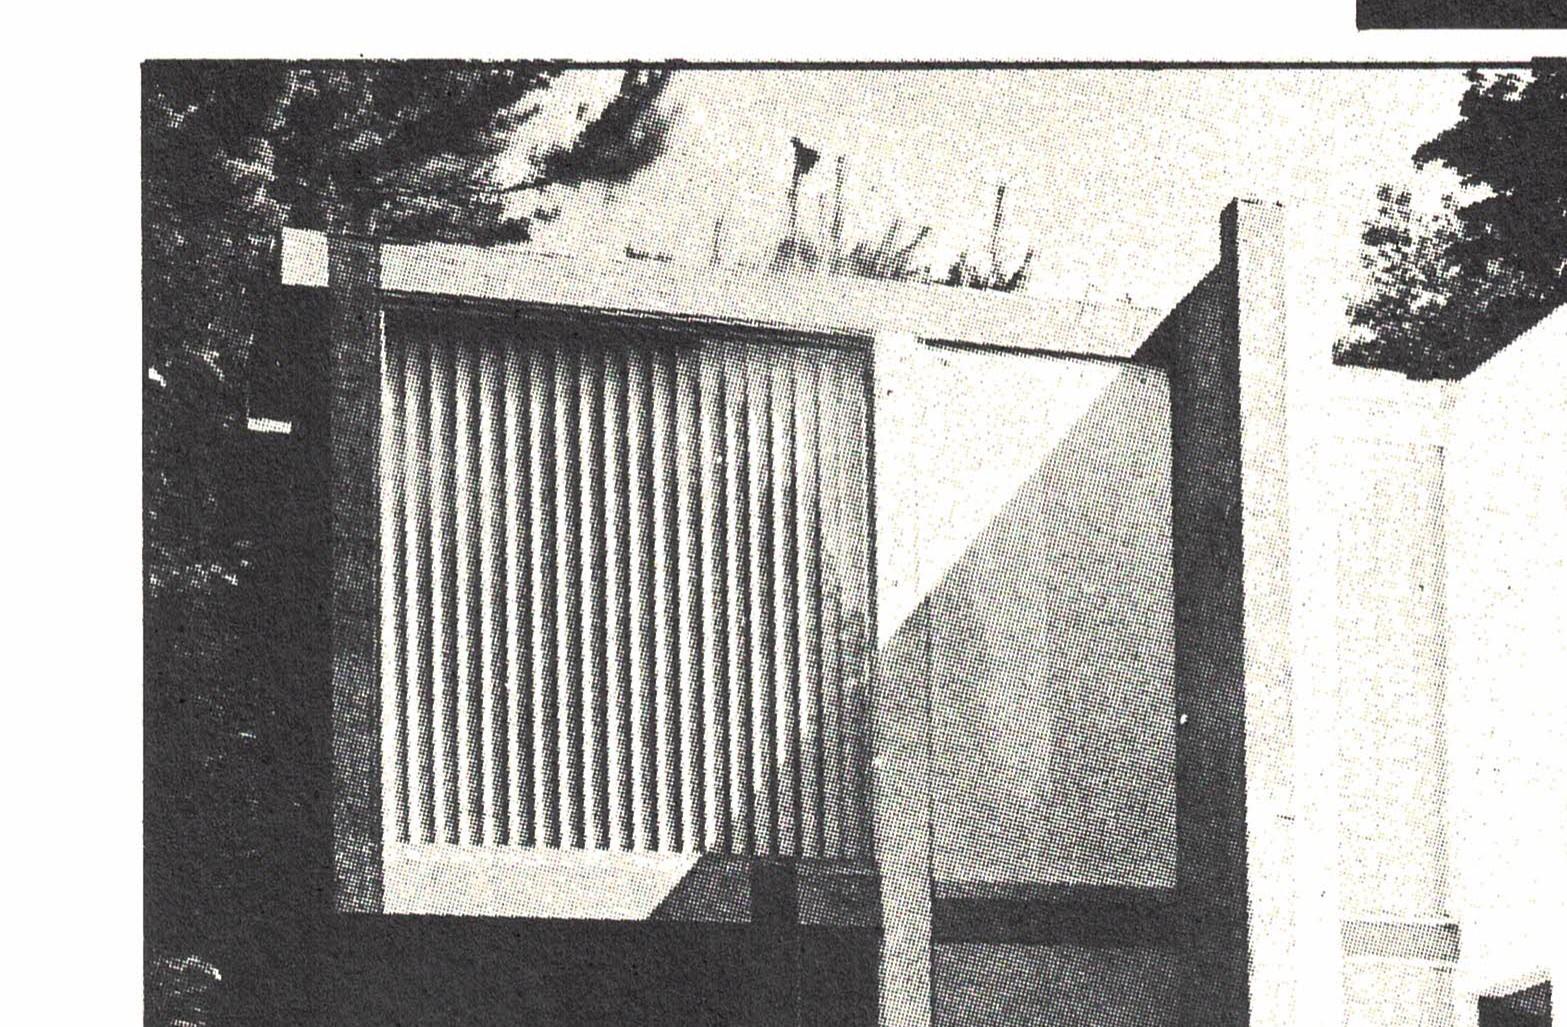 Figura 19. Eiseman, Casa VI, Washington, 1975